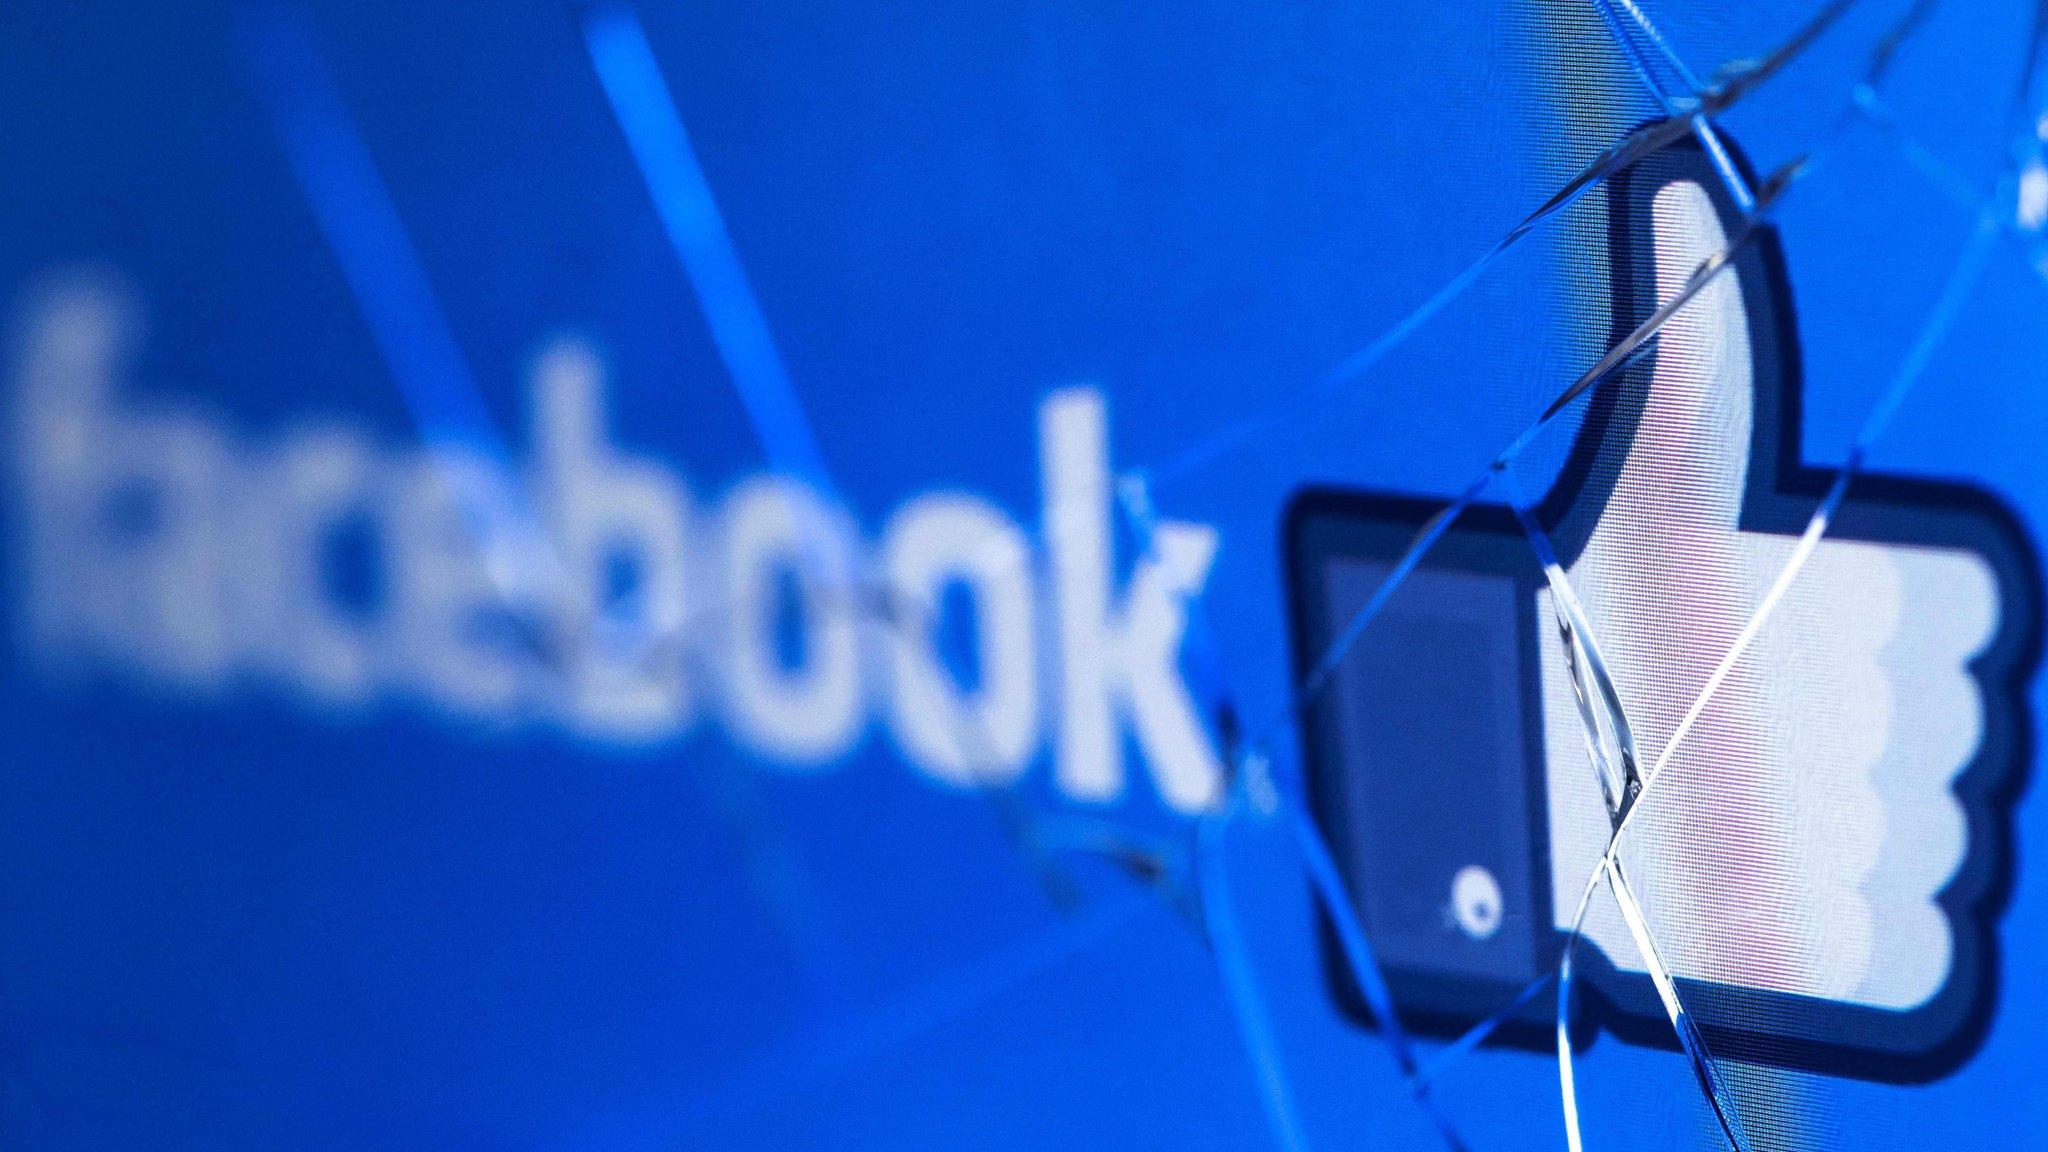 Facebook's hidden battle against ad-blockers